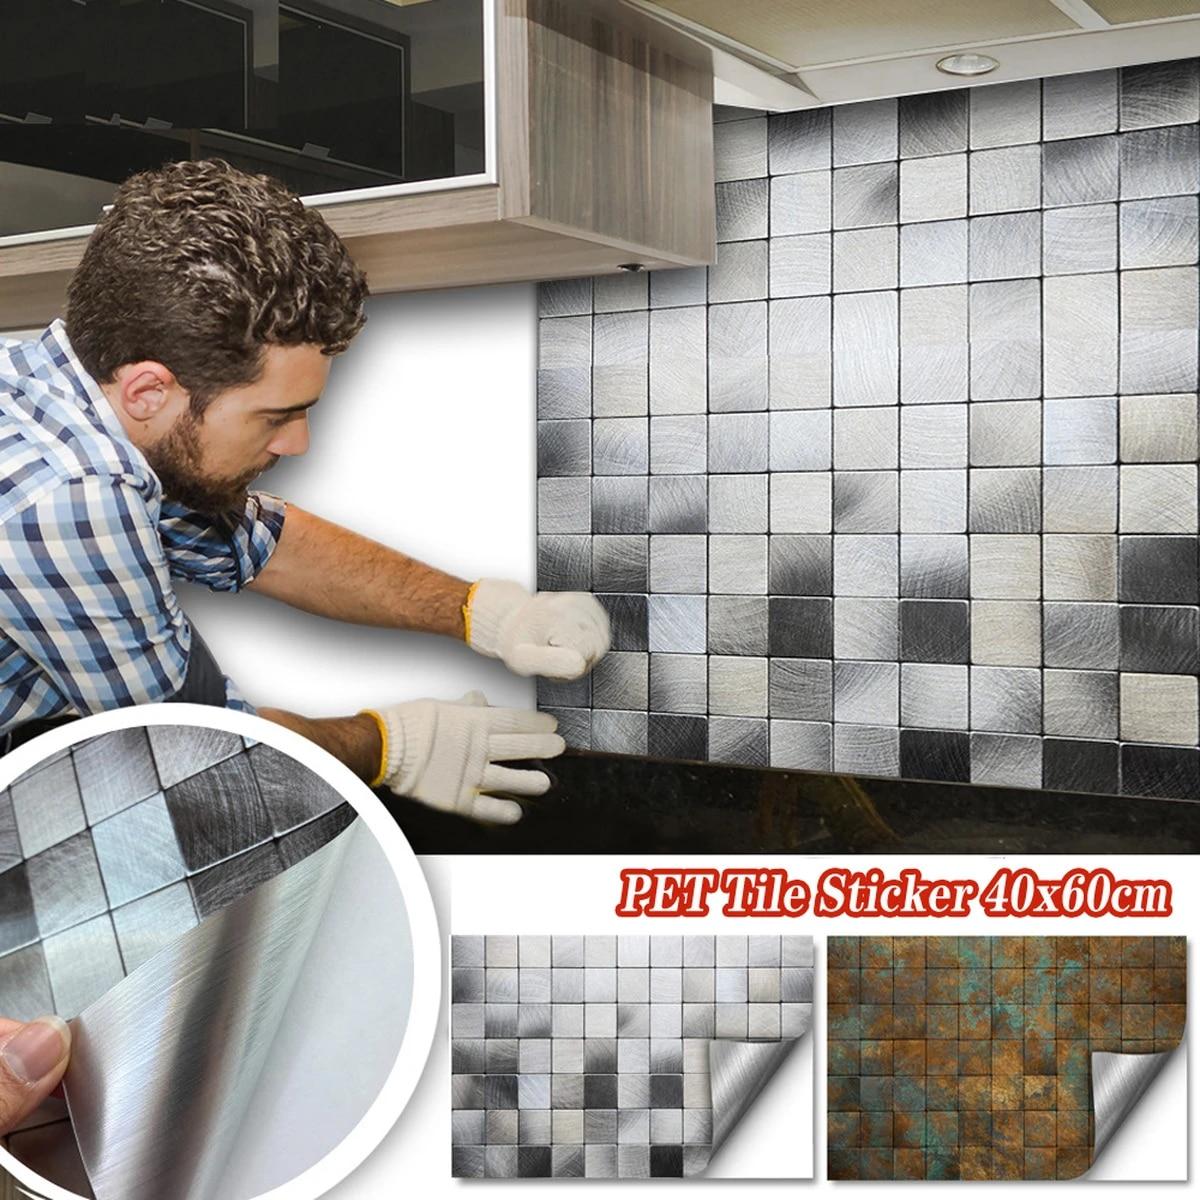 40x60cm self adhesive wallpaper removable ceiling tile kitchen oilproof decals waterproof backsplash peel stick tile